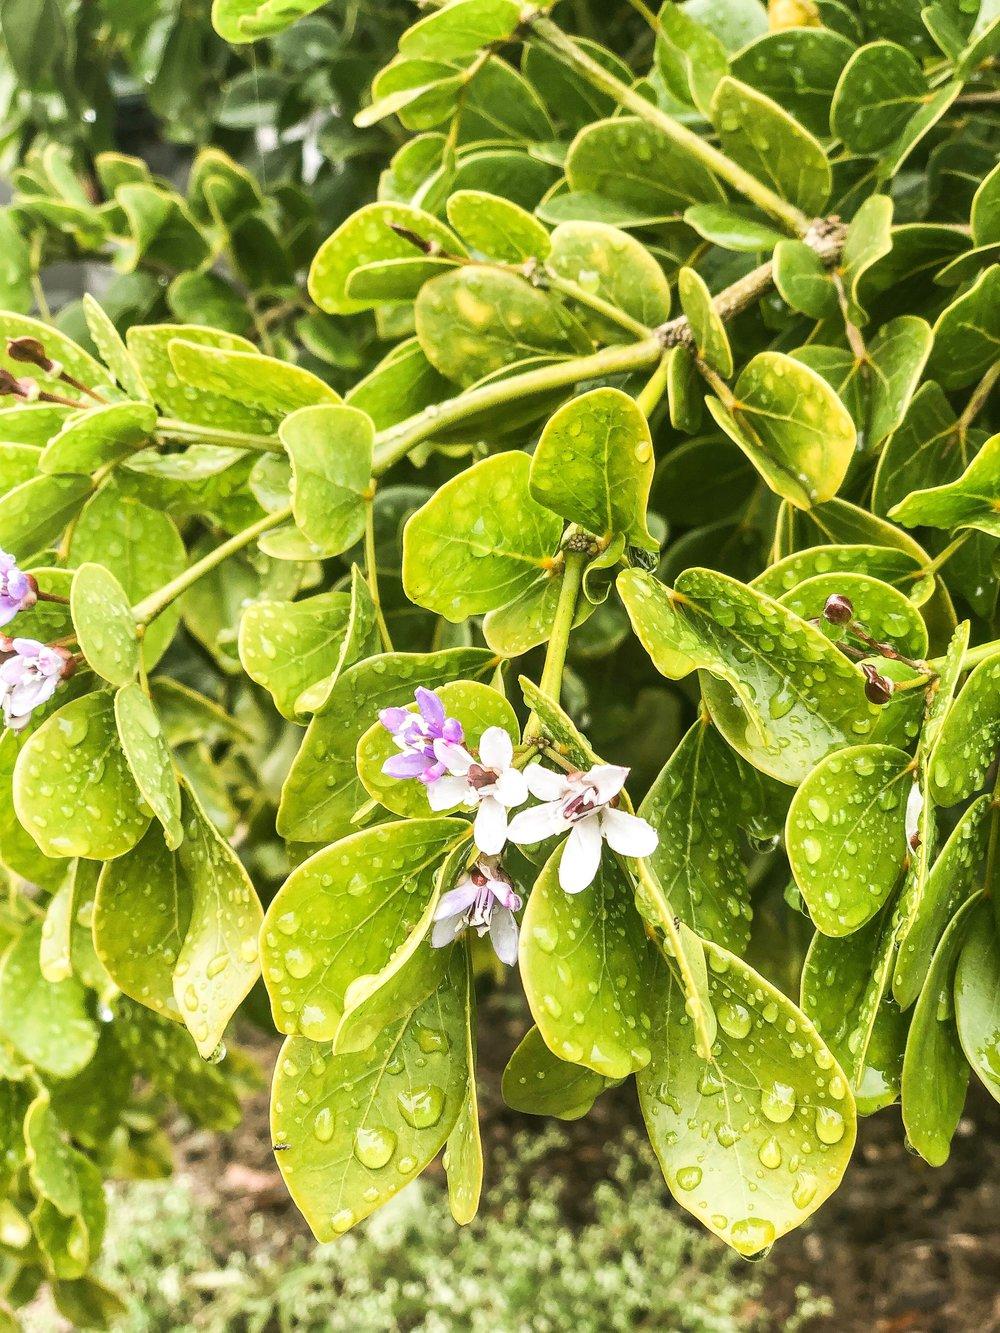 guaiacum officinale lignumvitae plant creations inc..JPG